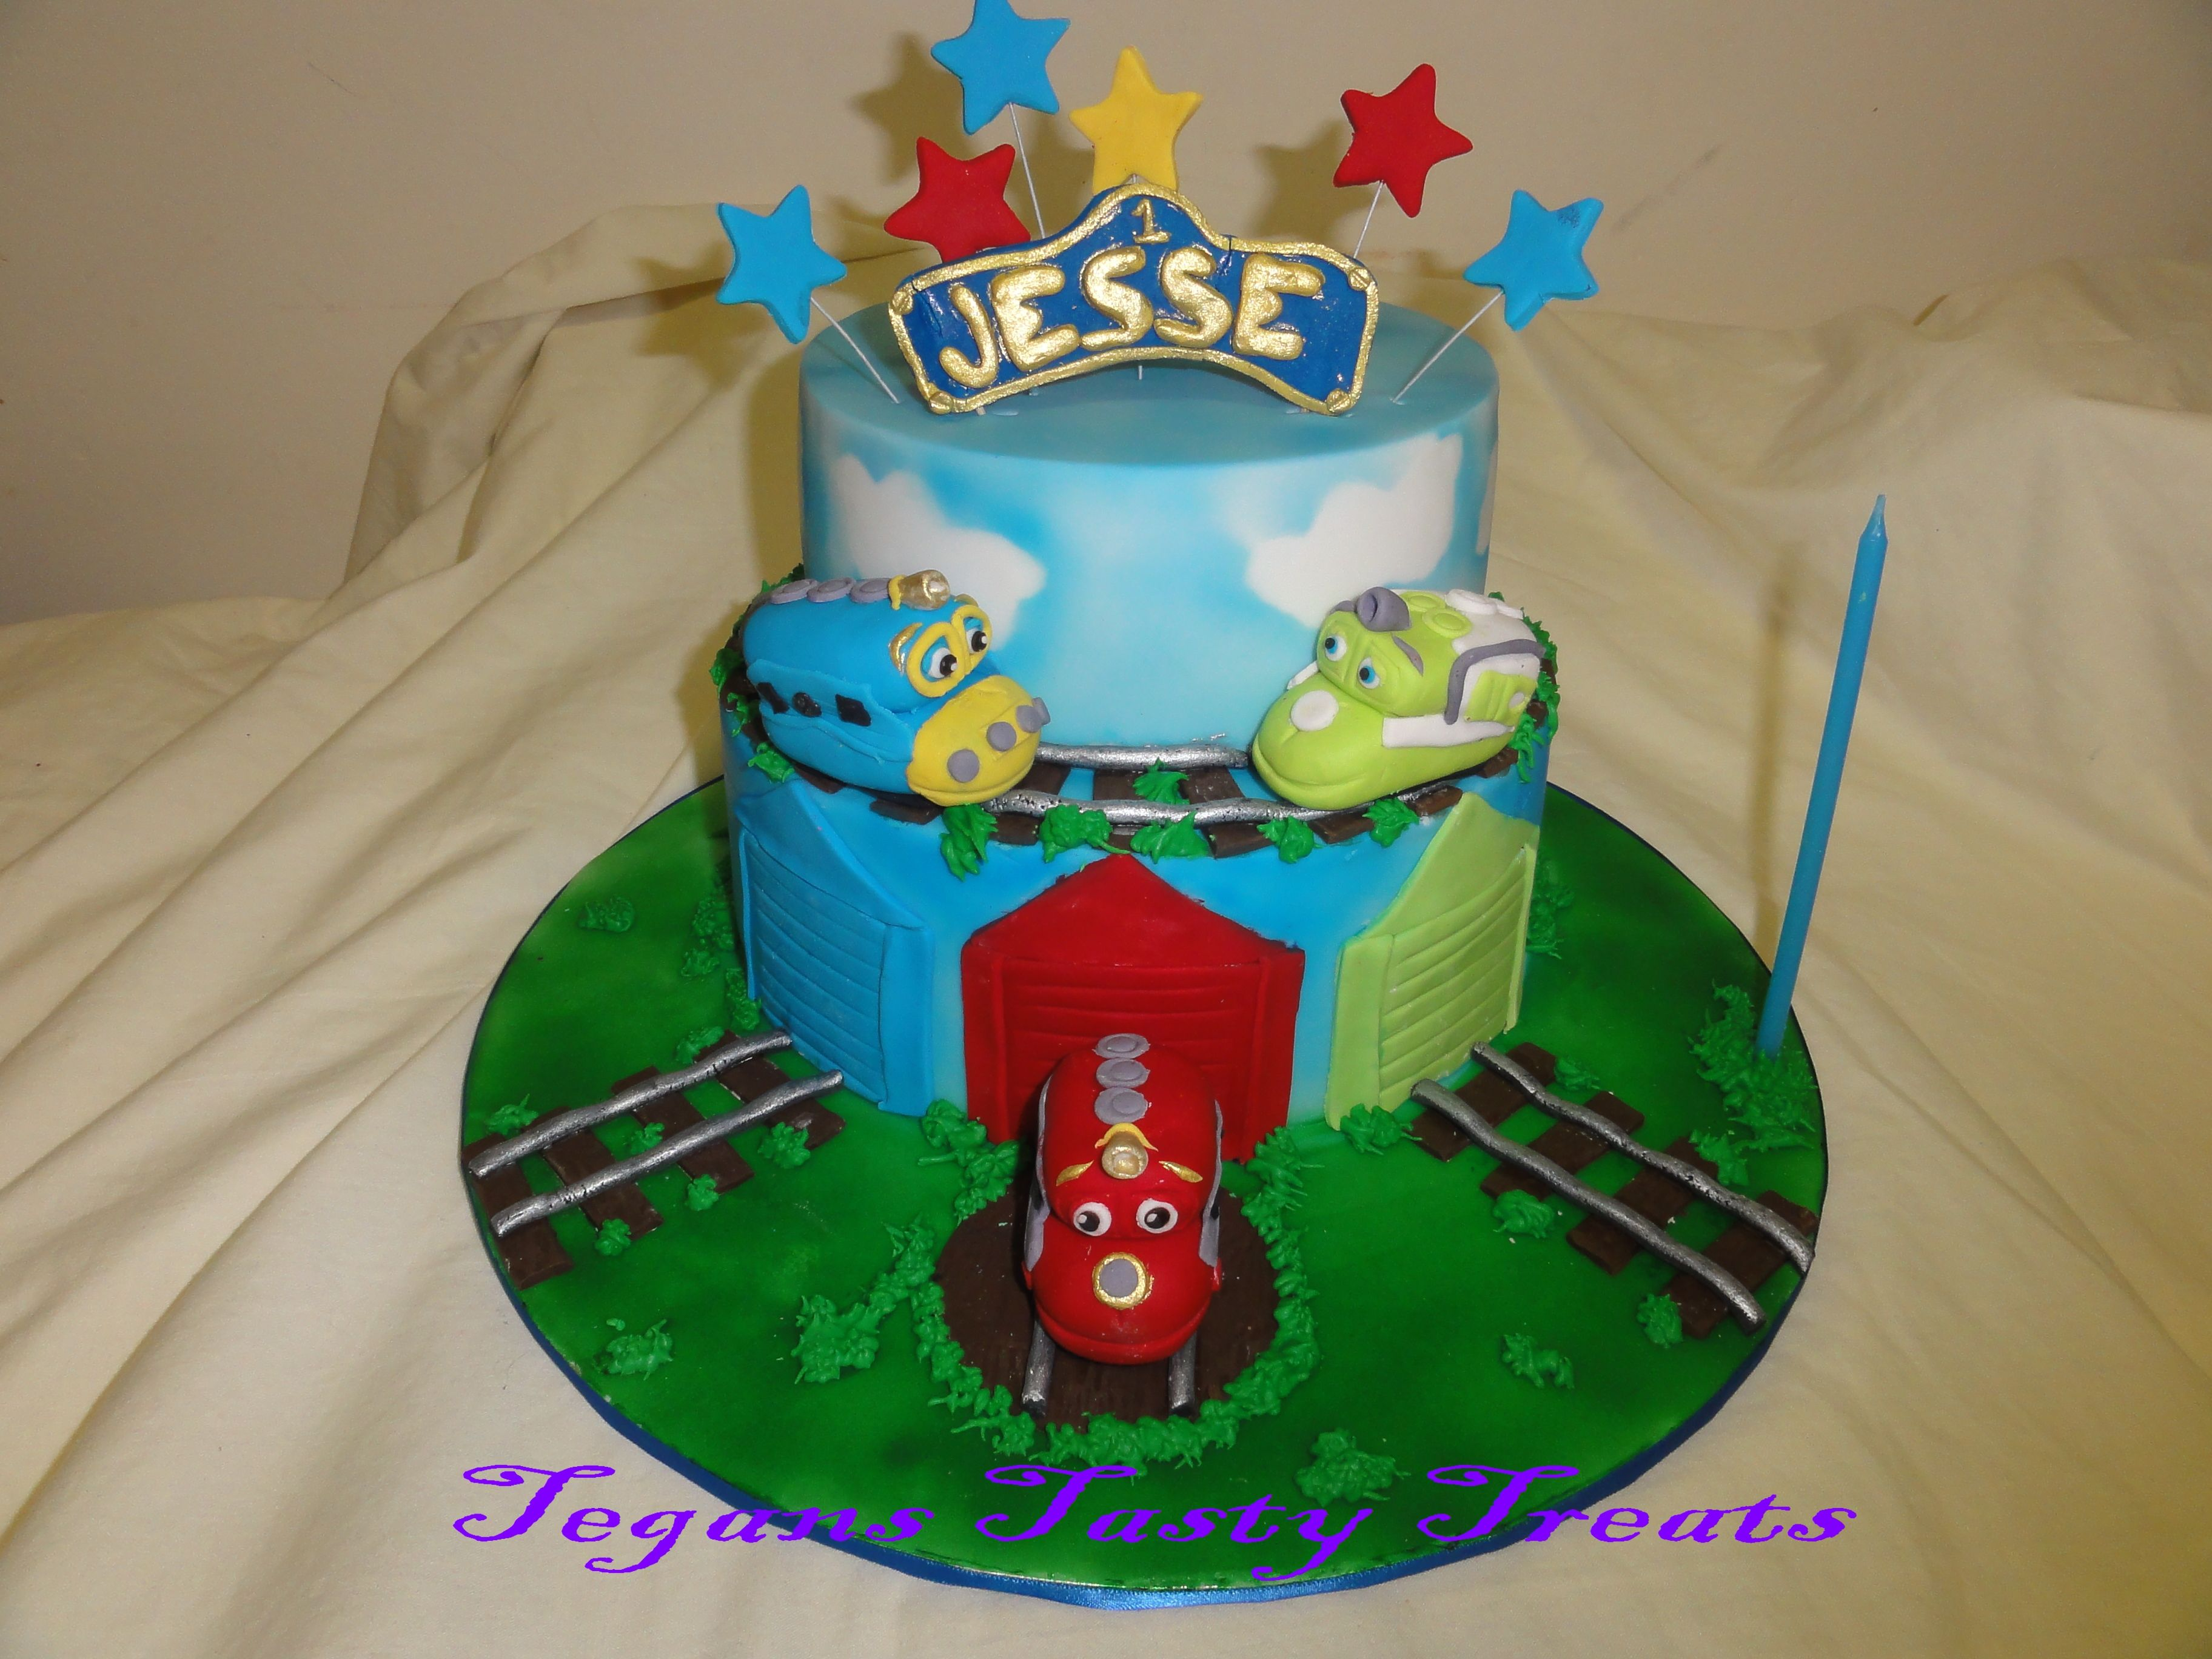 Chuggington cake cakesforkids traincake cakesforboys A 2 tier